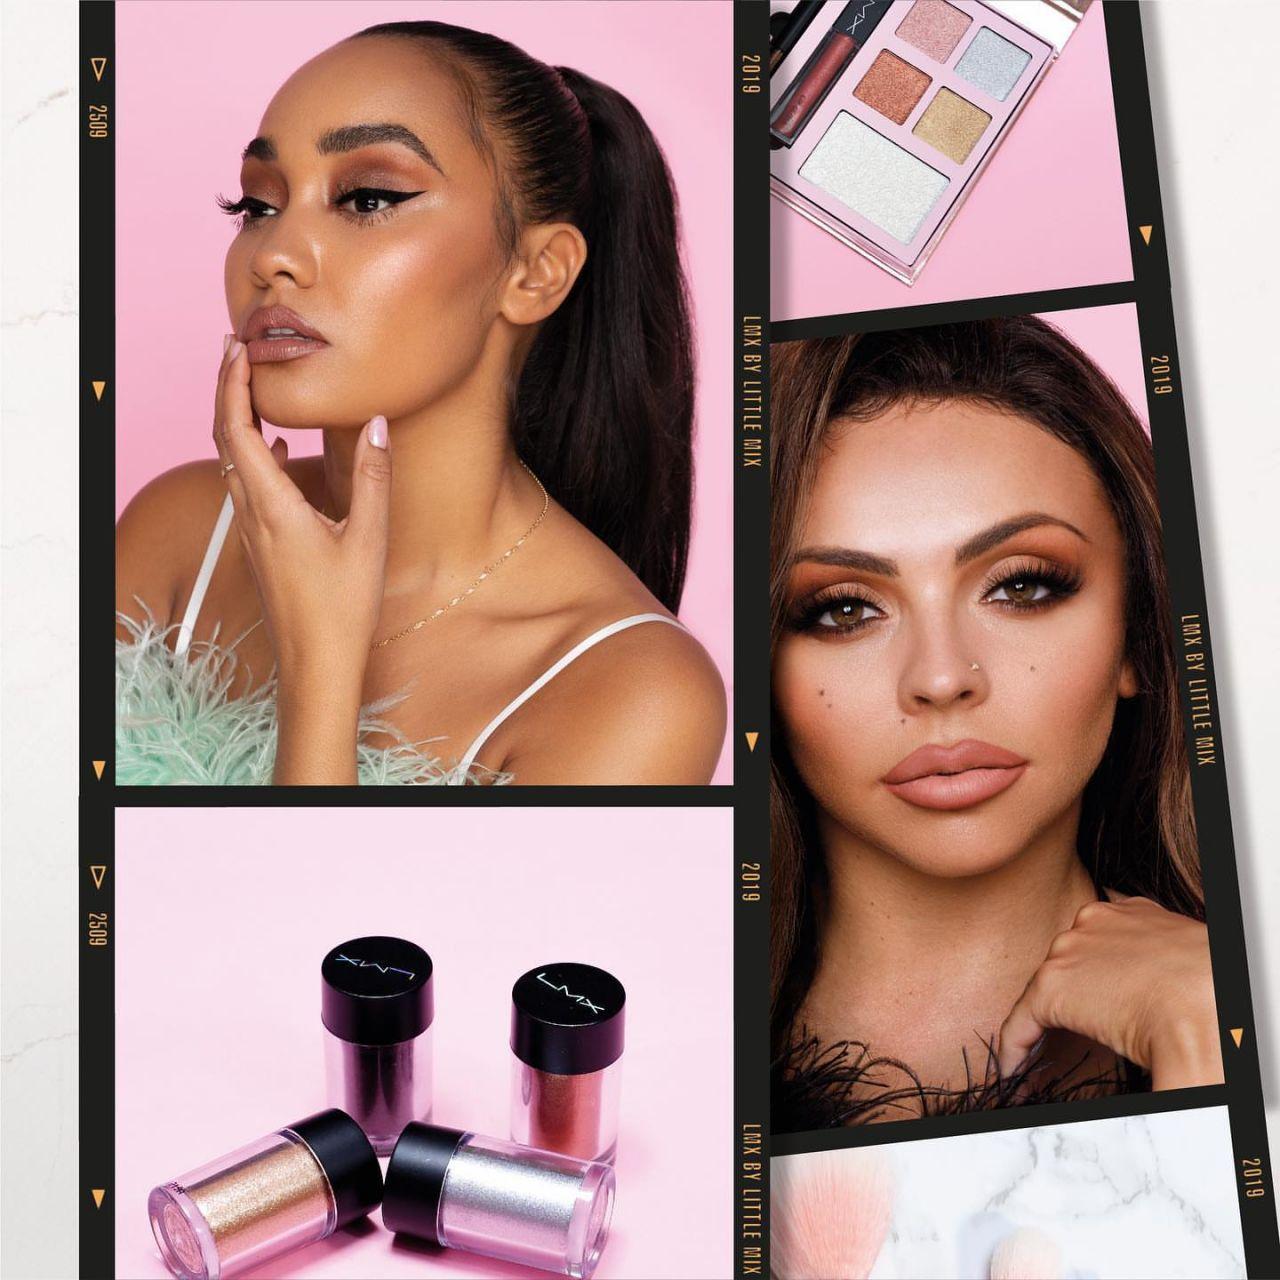 Little Mix \u2013 Photoshoot for \u201cLMX\u201d Cosmetics Range 2019 (more photos) \u2022 CelebMafia